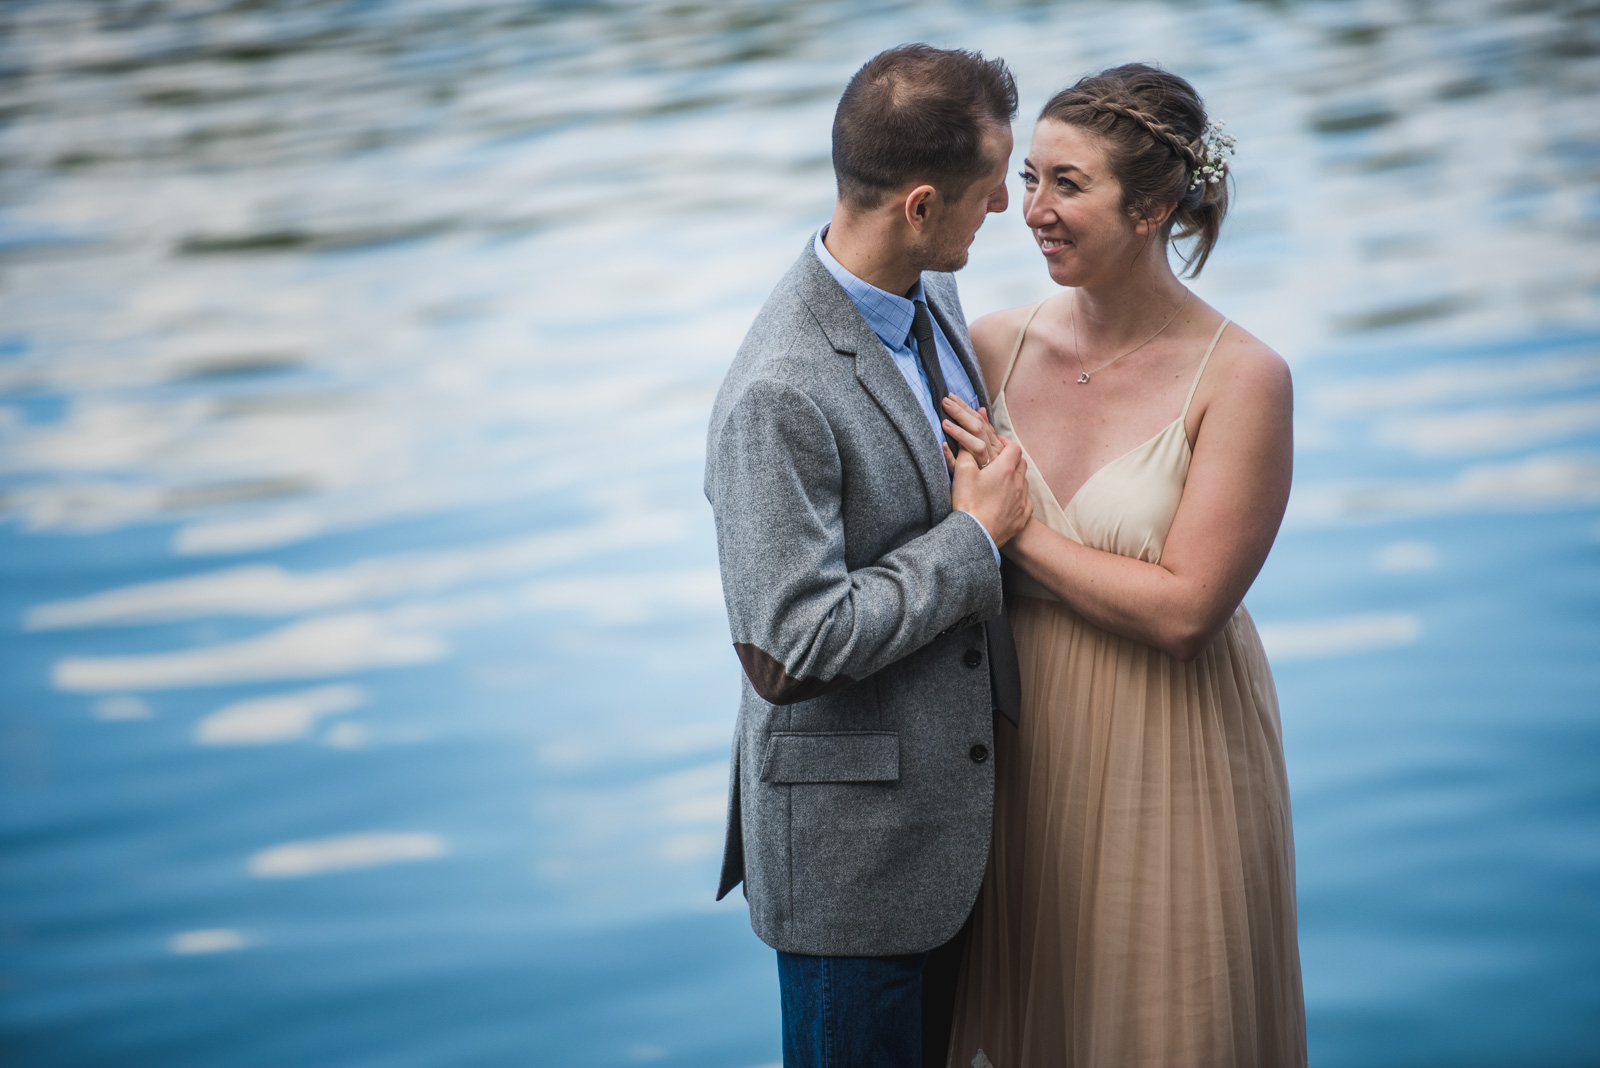 vancouver-island-wedding-photographers-cliff-gilker-park-smugglers-cove-elopement-31.jpg